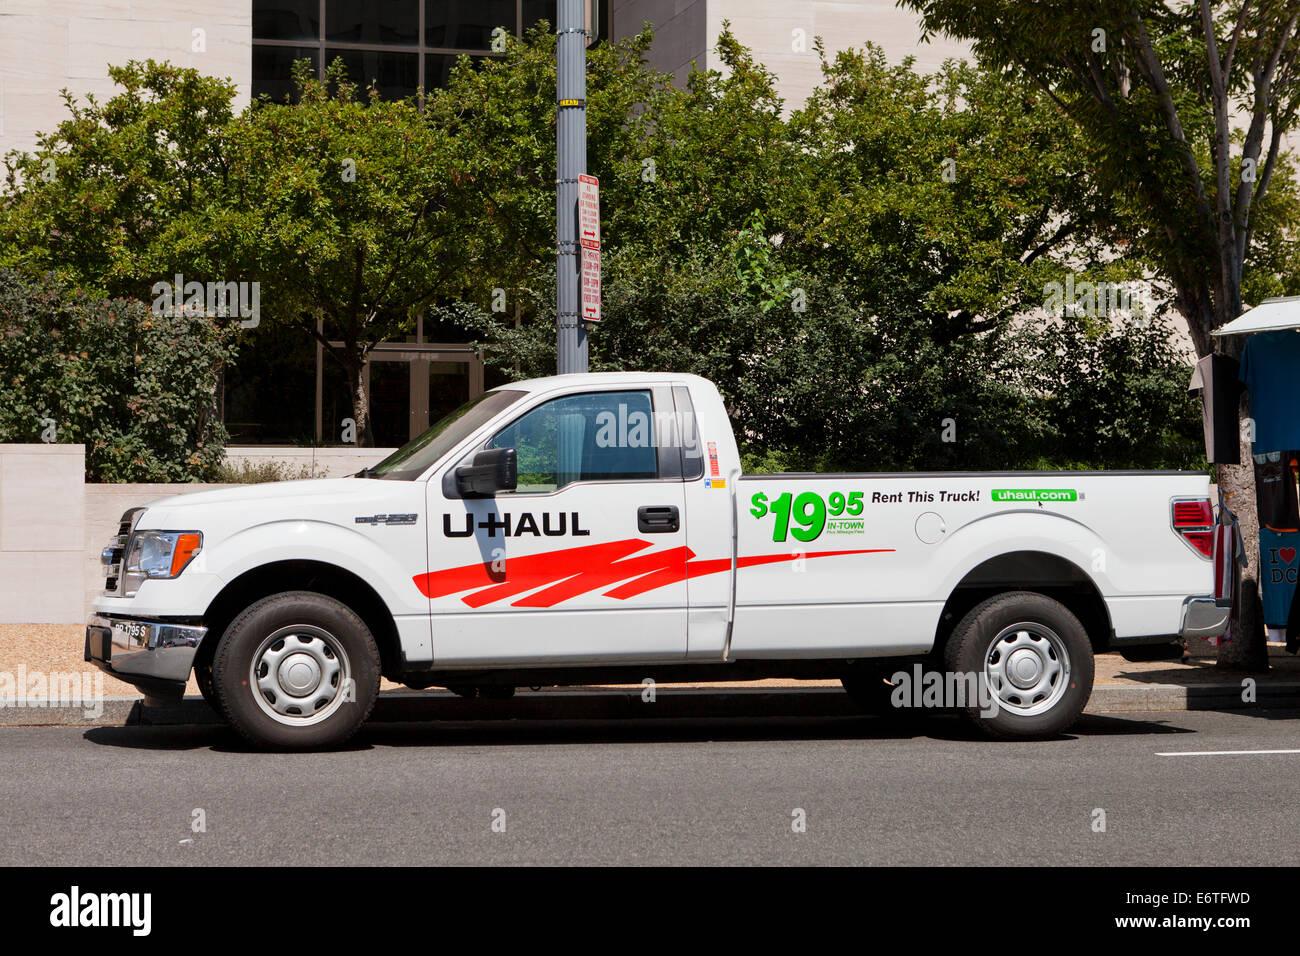 U Haul Rental Pickup Truck Usa Stock Photo Royalty Free